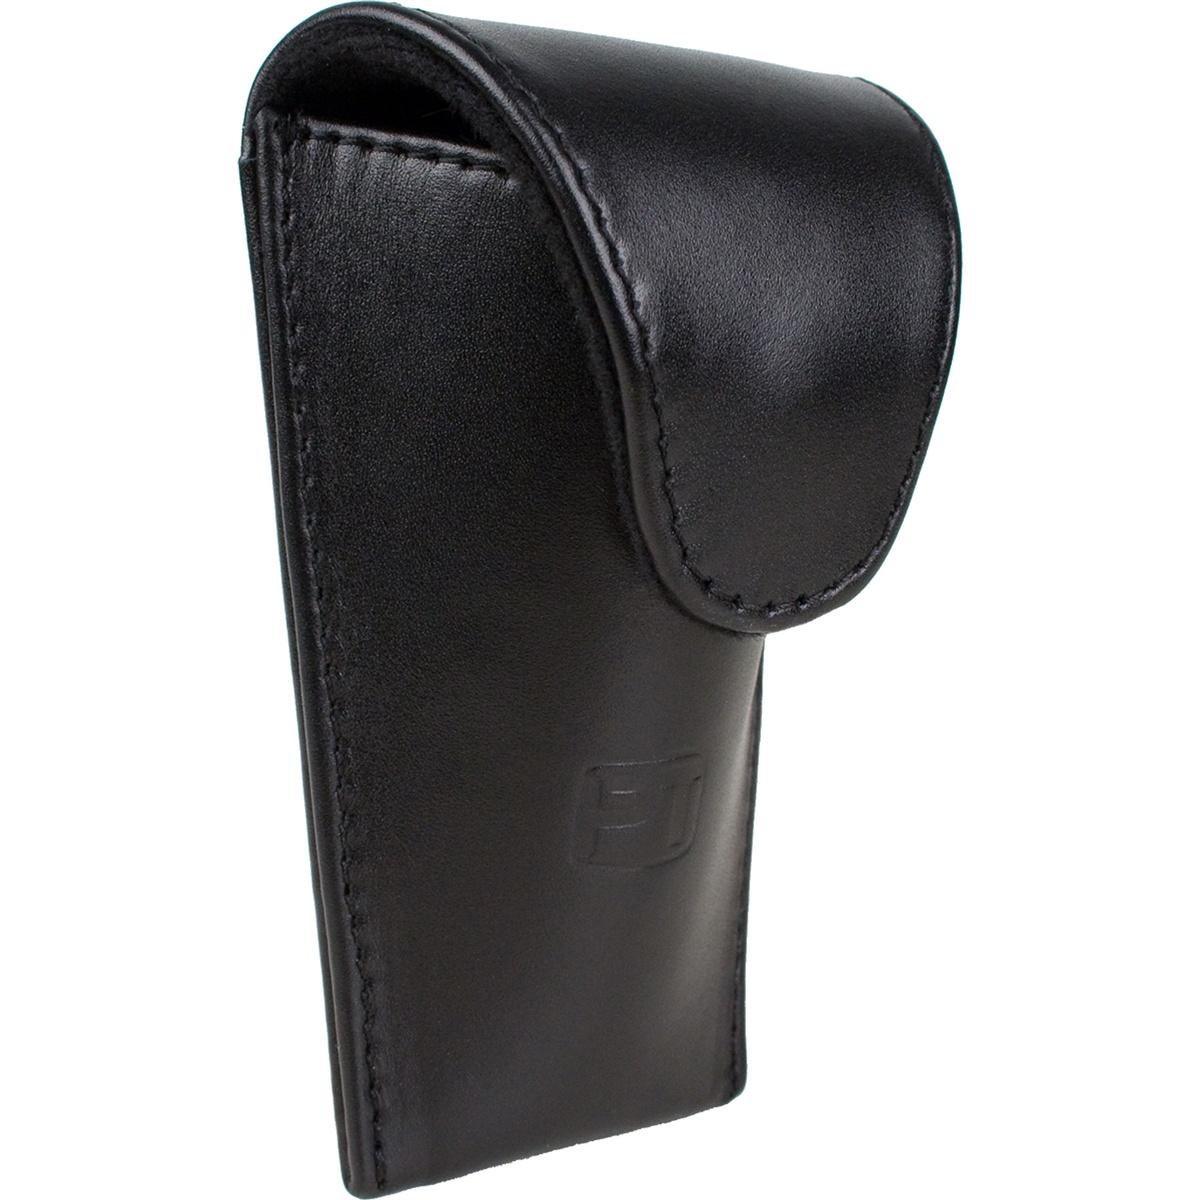 Protec Protec Tuba Leather Mouthpiece Pouch